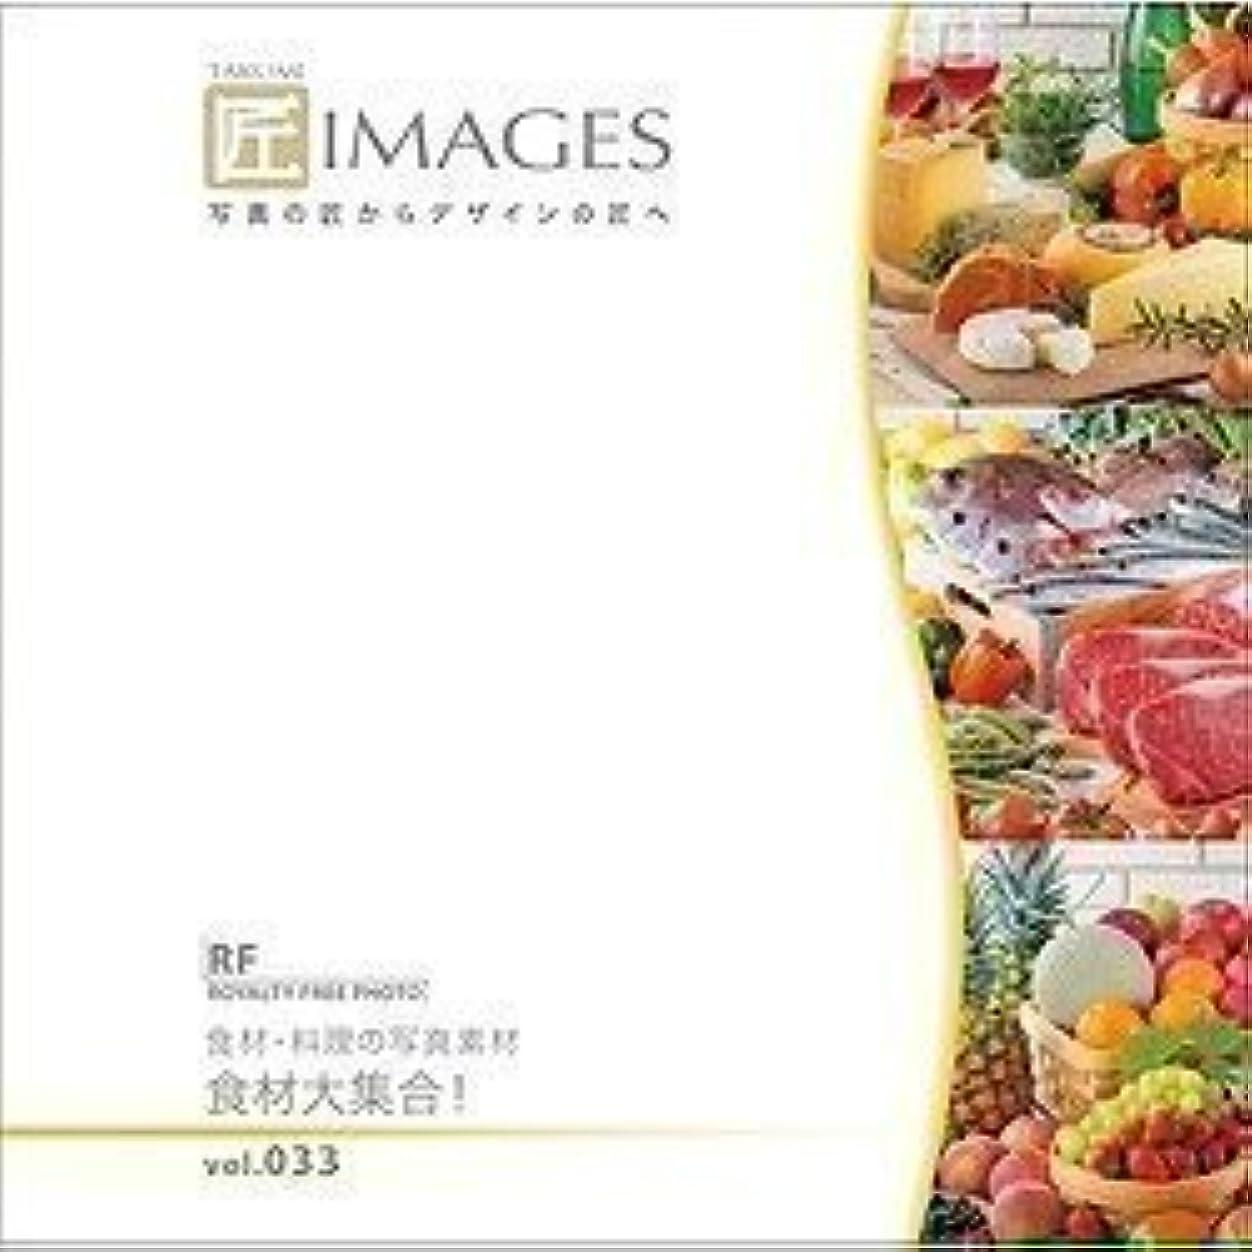 単調な施設賃金匠IMAGES Vol.033 食材?料理の写真素材 食材大集合!